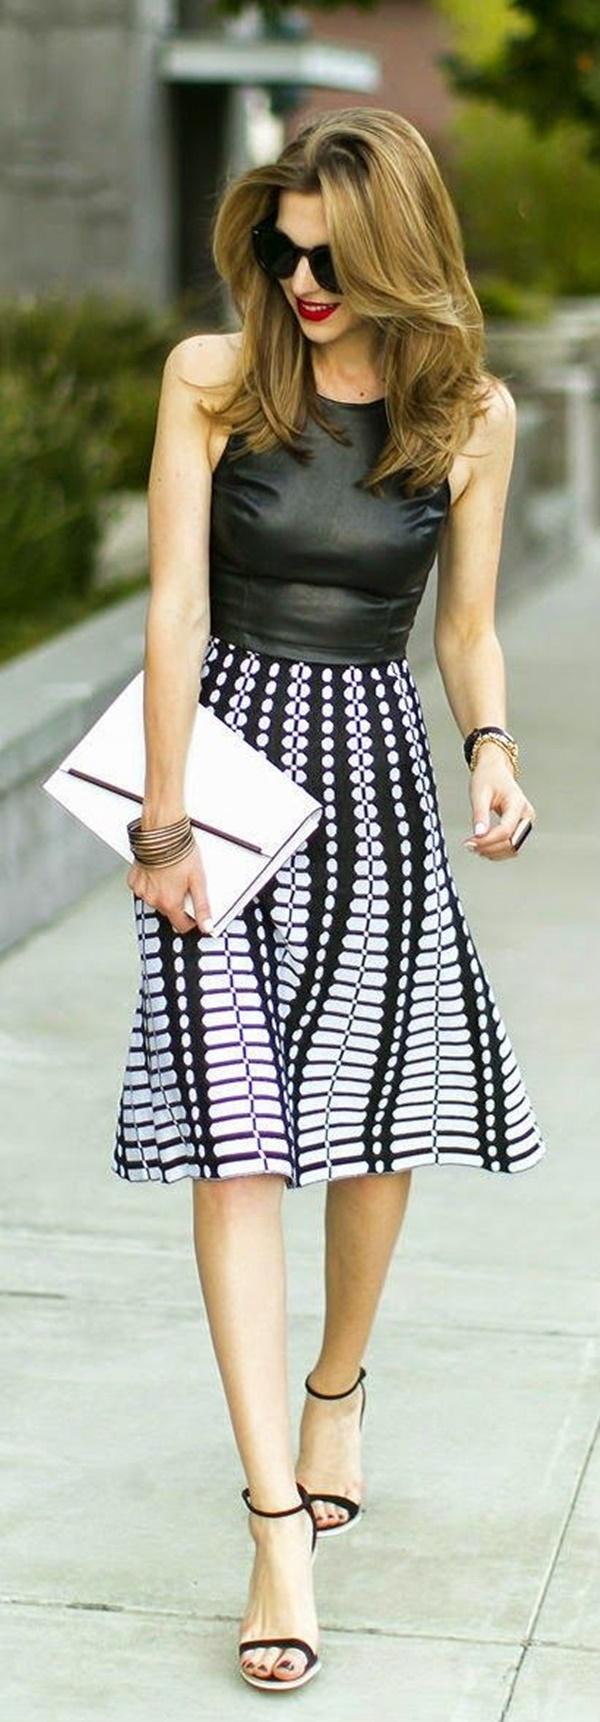 Chic Street style women fashion33